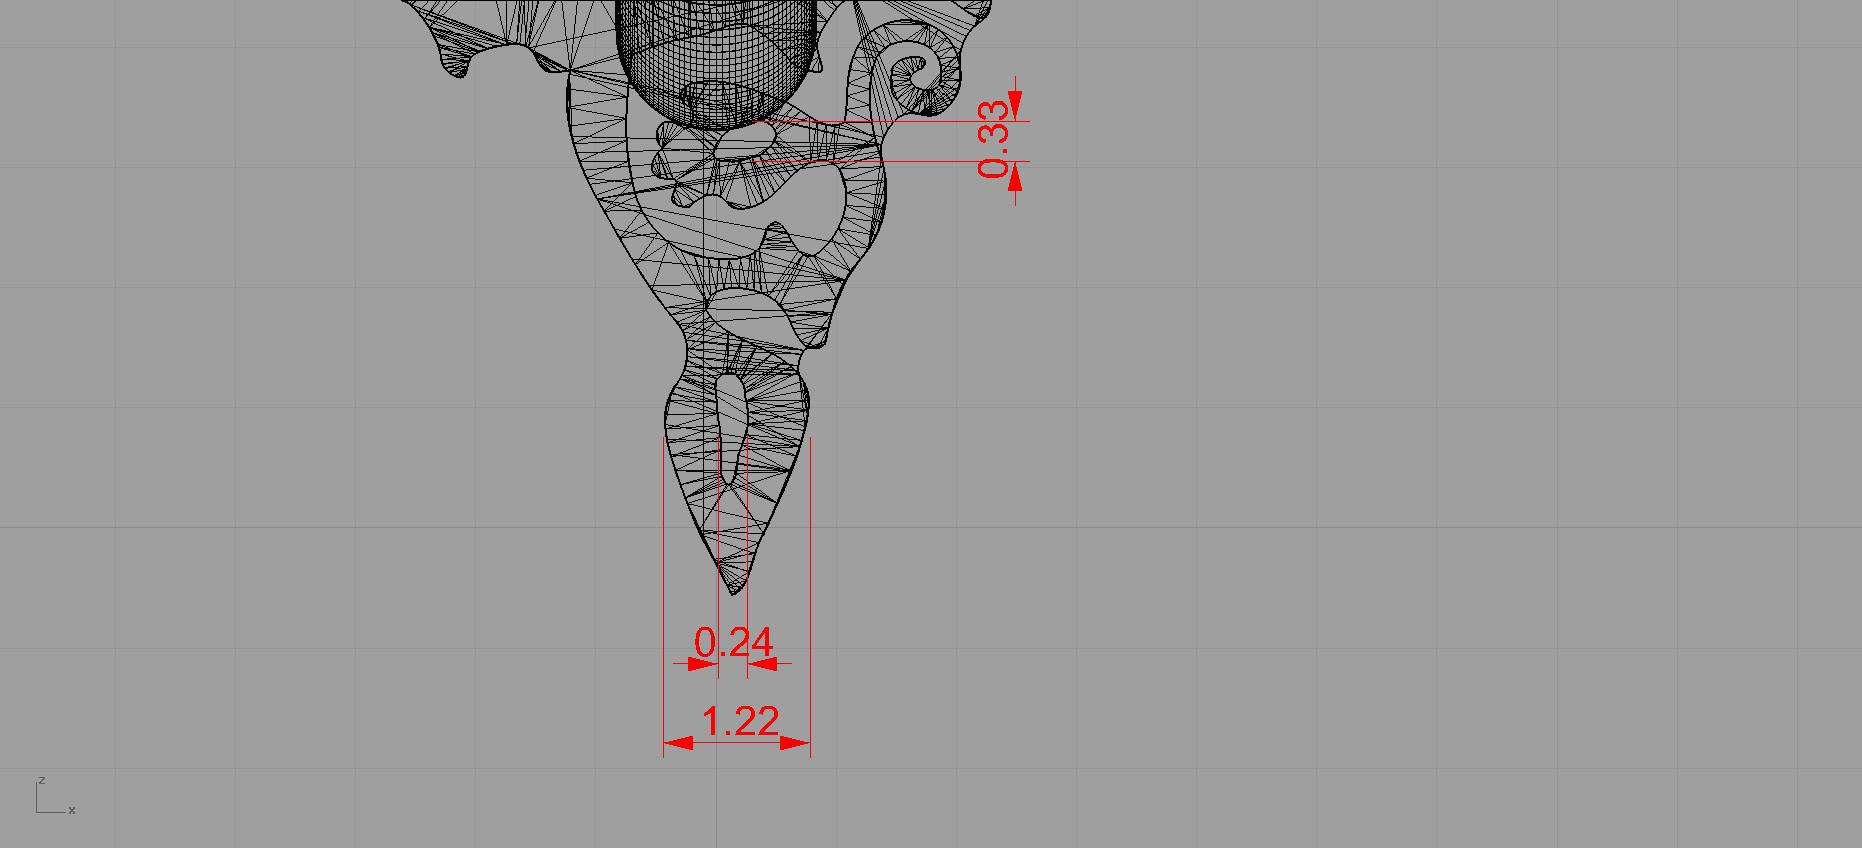 vikings pendant dimensions.jpg